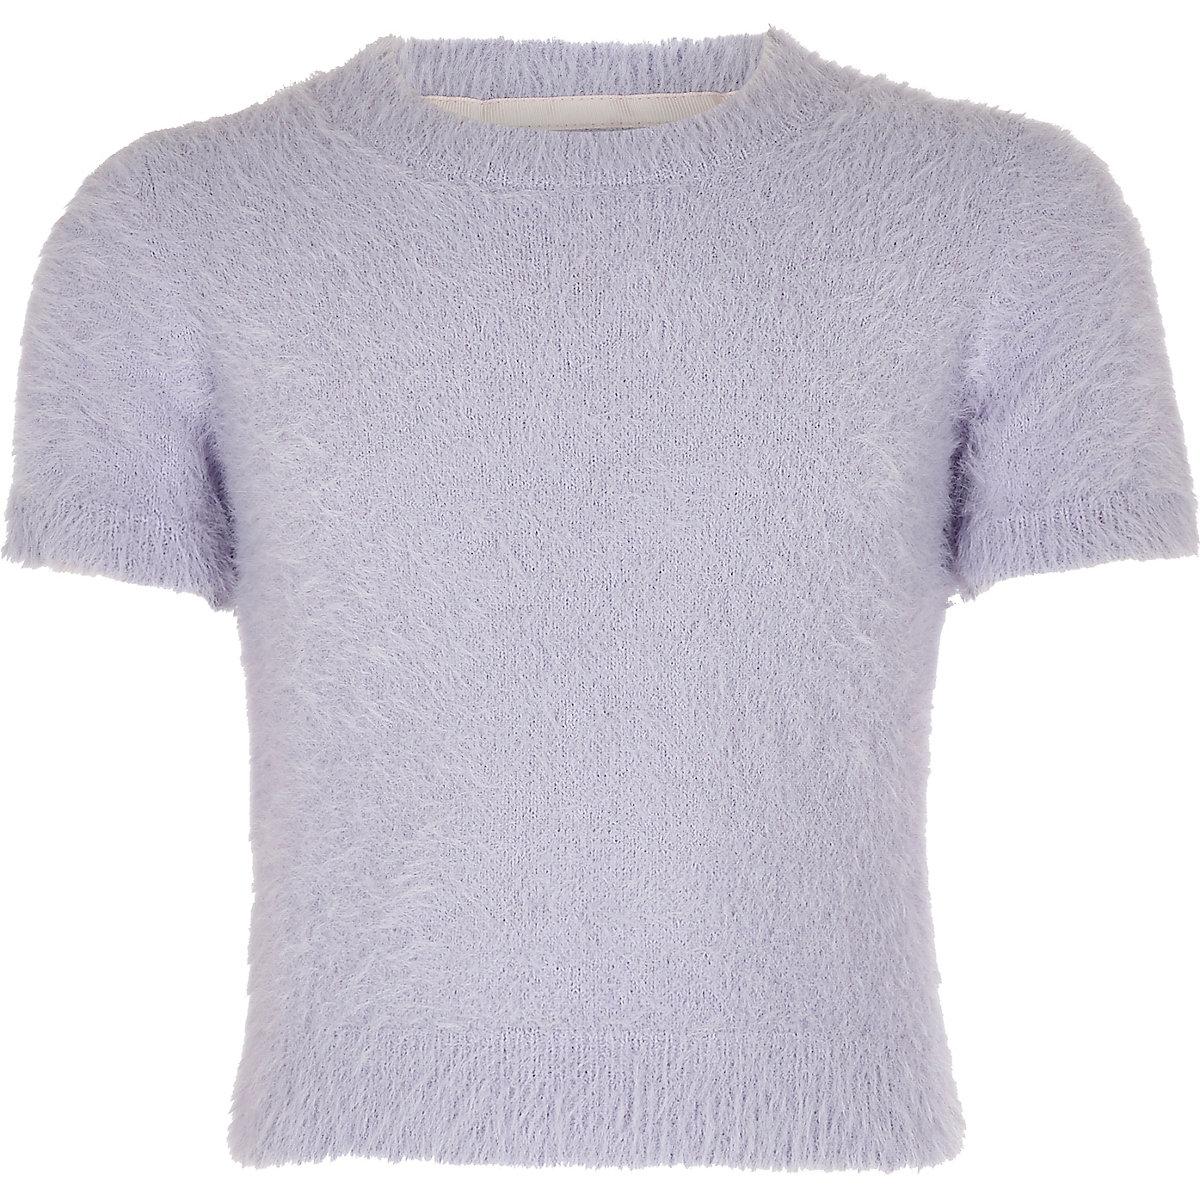 Girls purple fluffy knit T-shirt